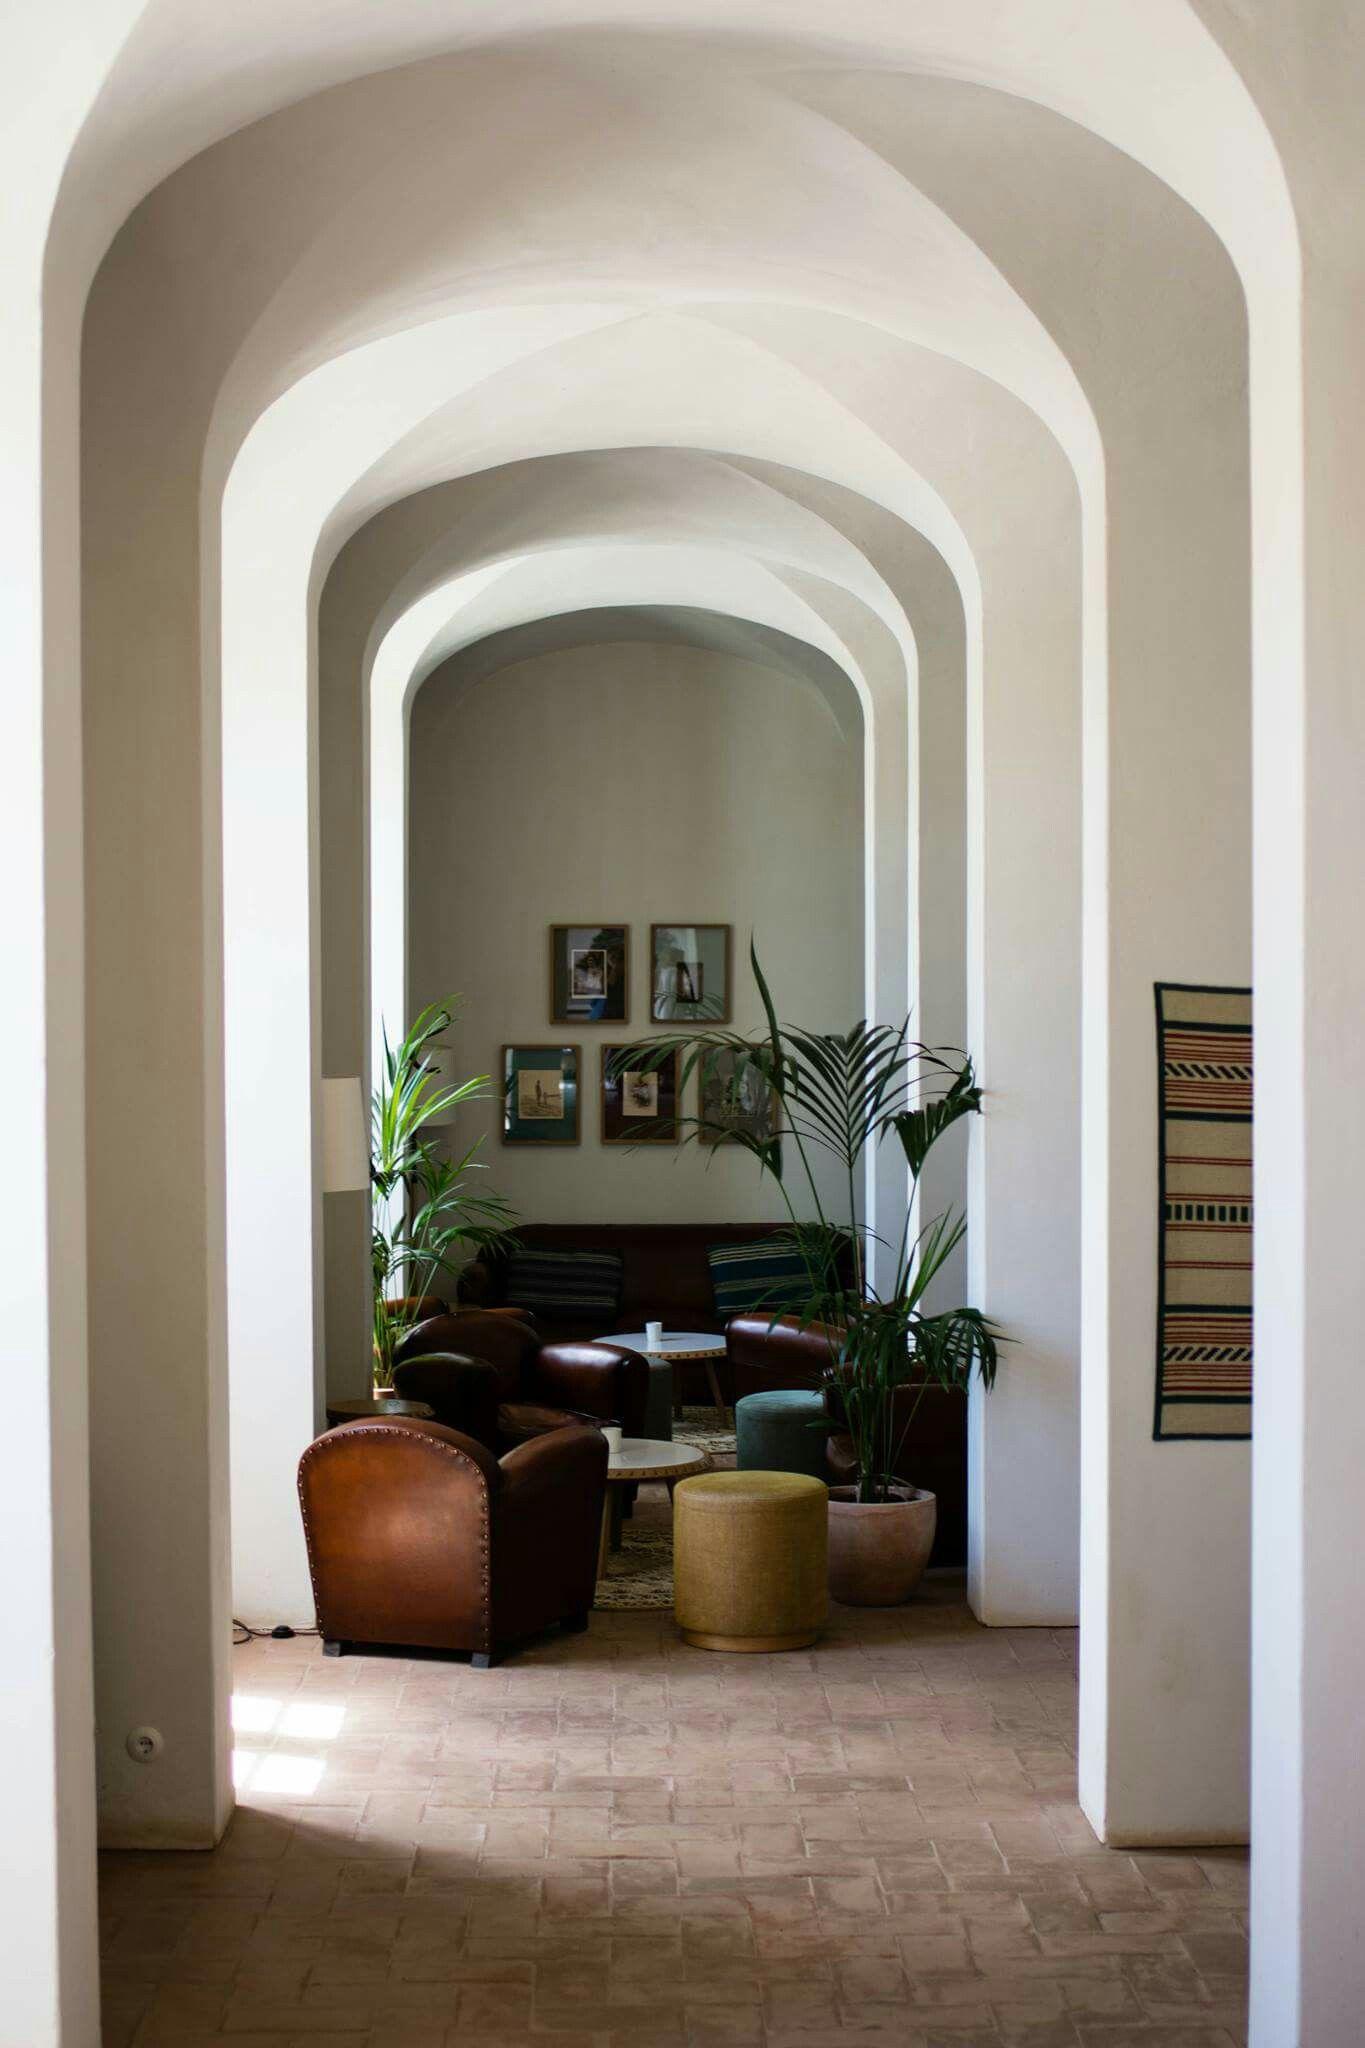 Sao Lourenco do Barrocal, Alentejo / Portugal Architecture and photography